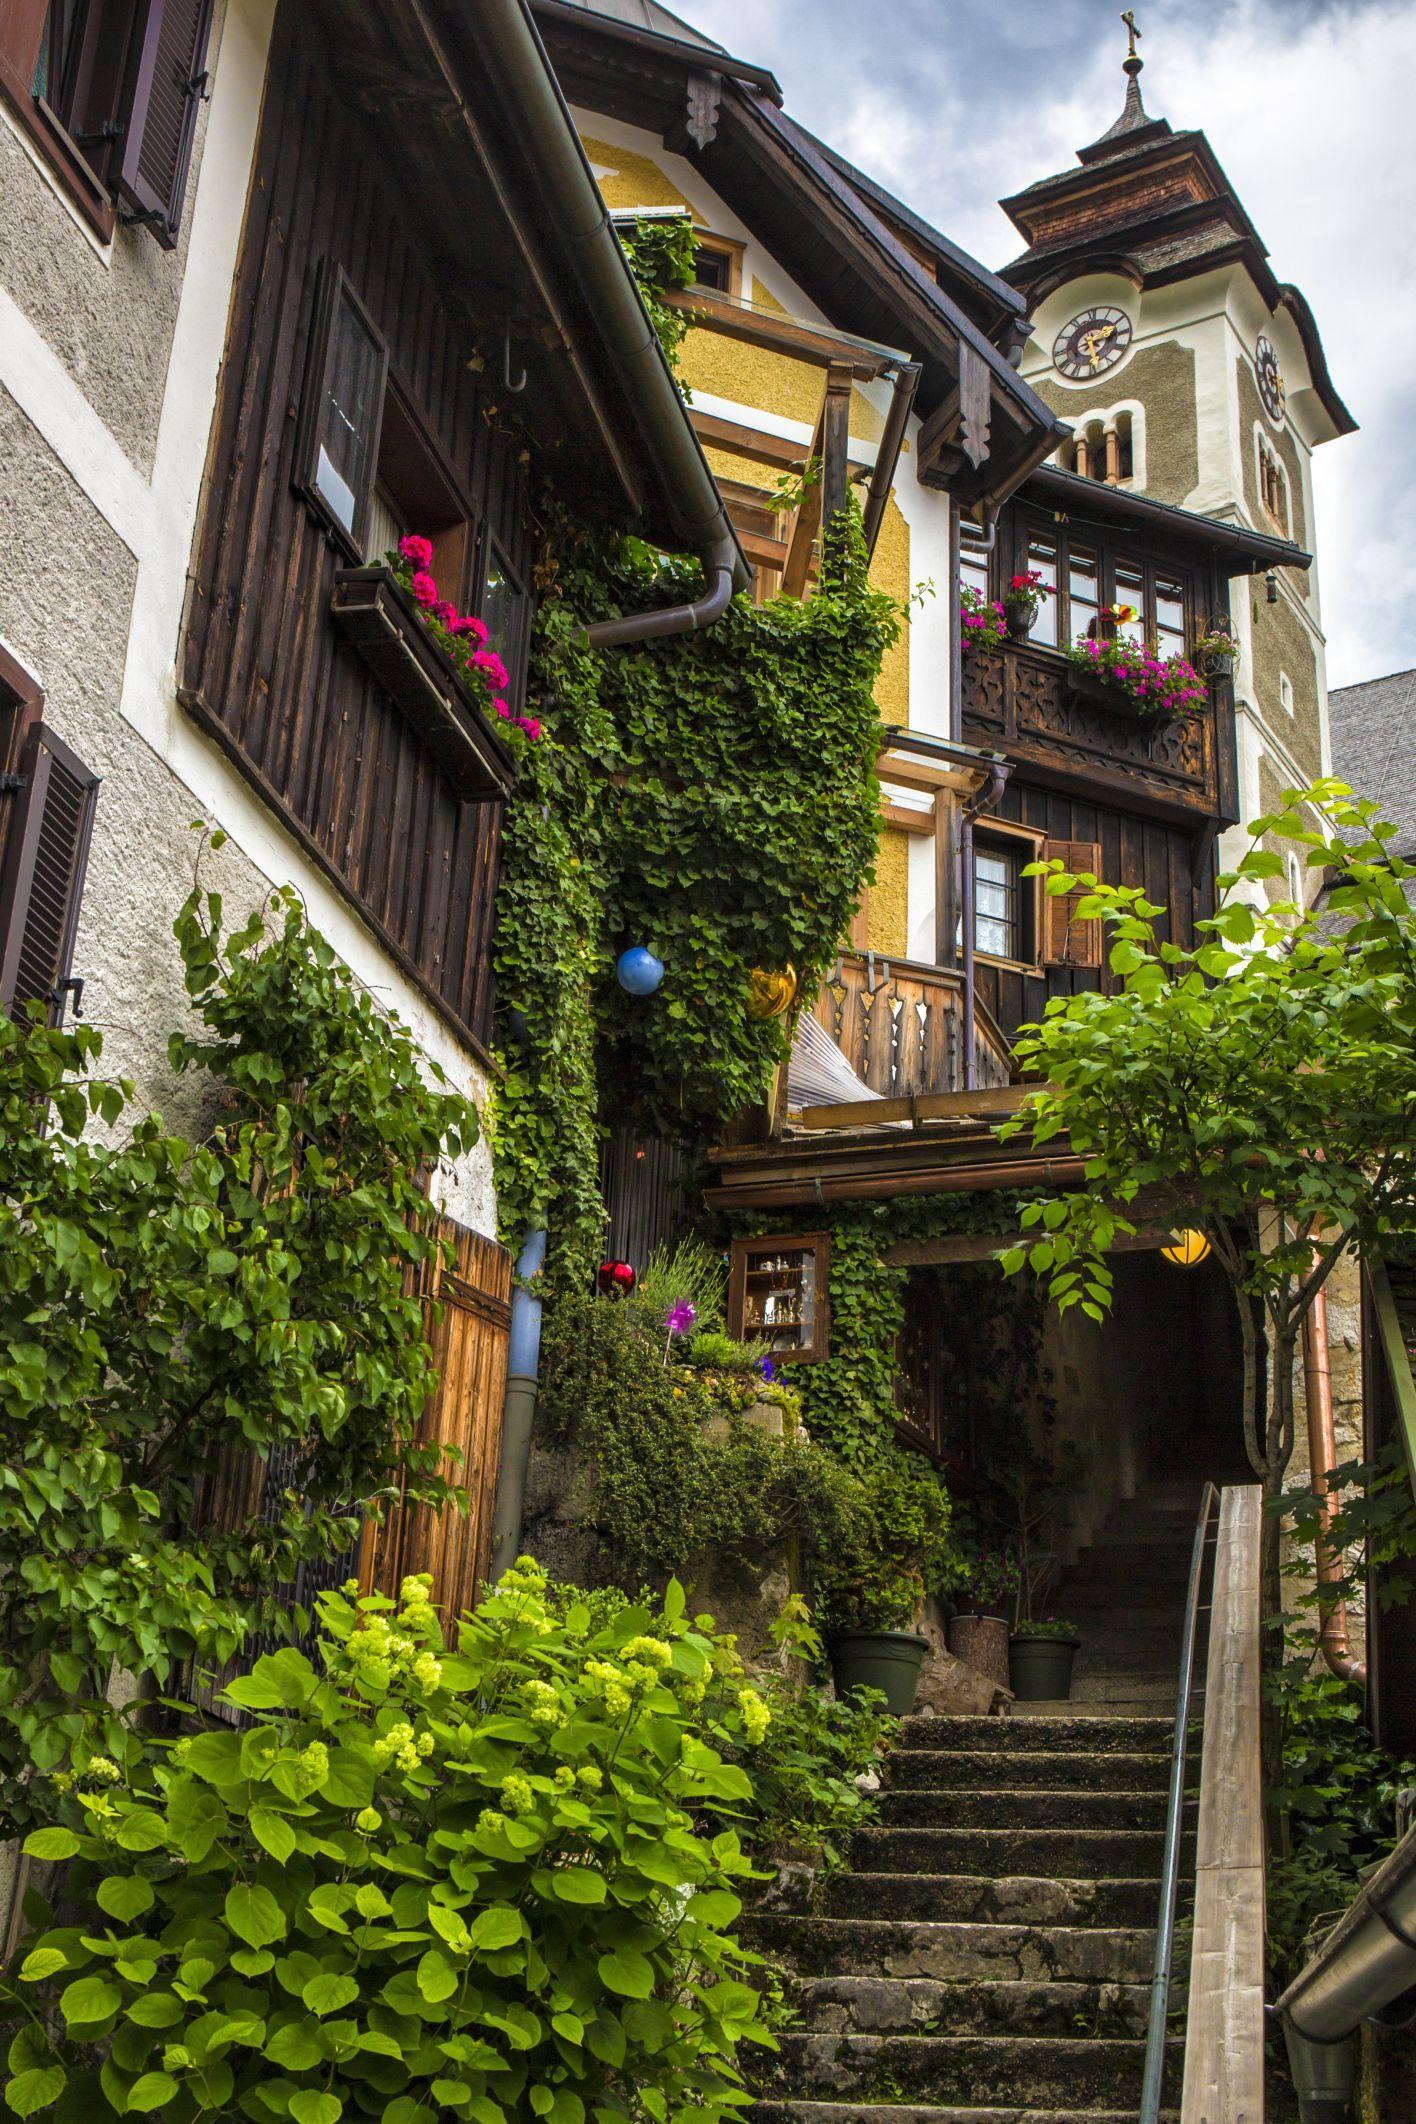 46 ideas de Austria.Casas.Calles. en 2021   salzburgo, lugares preciosos,  lugares hermosos